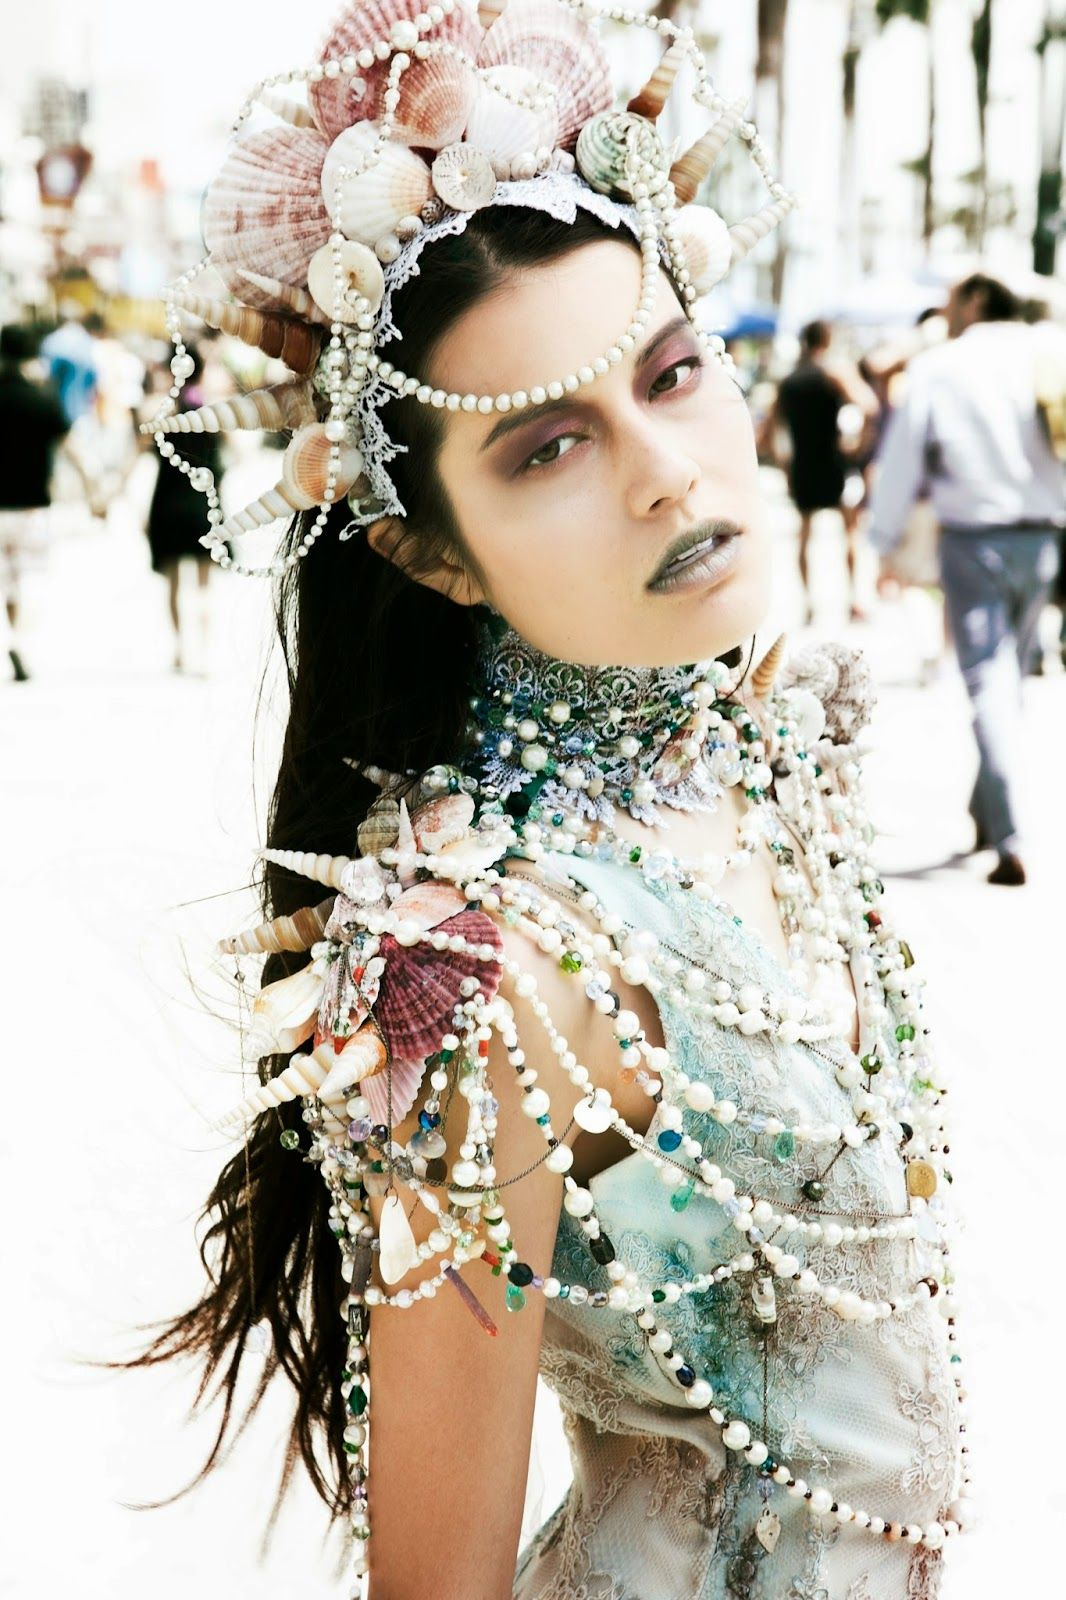 Mascherina: The Mermaid of Venice Beach